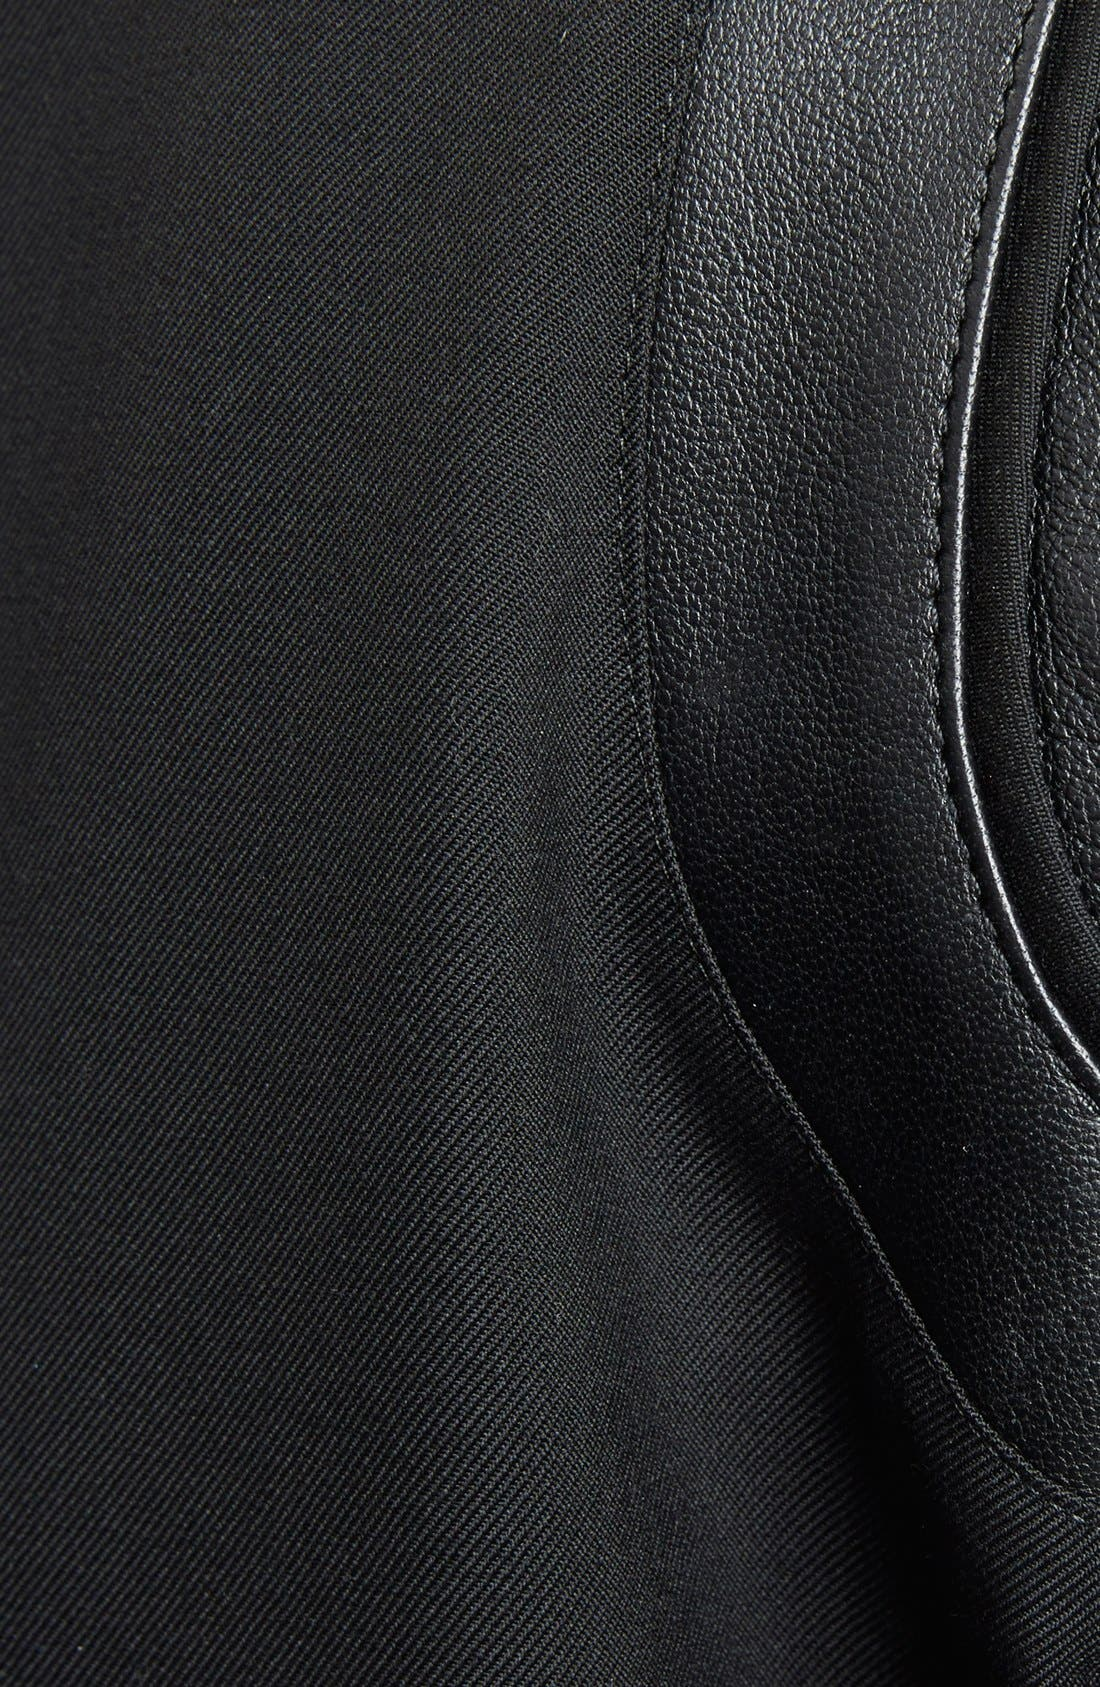 Alternate Image 3  - Saint Laurent 'Teddy' Black Leather Trim Bomber Jacket